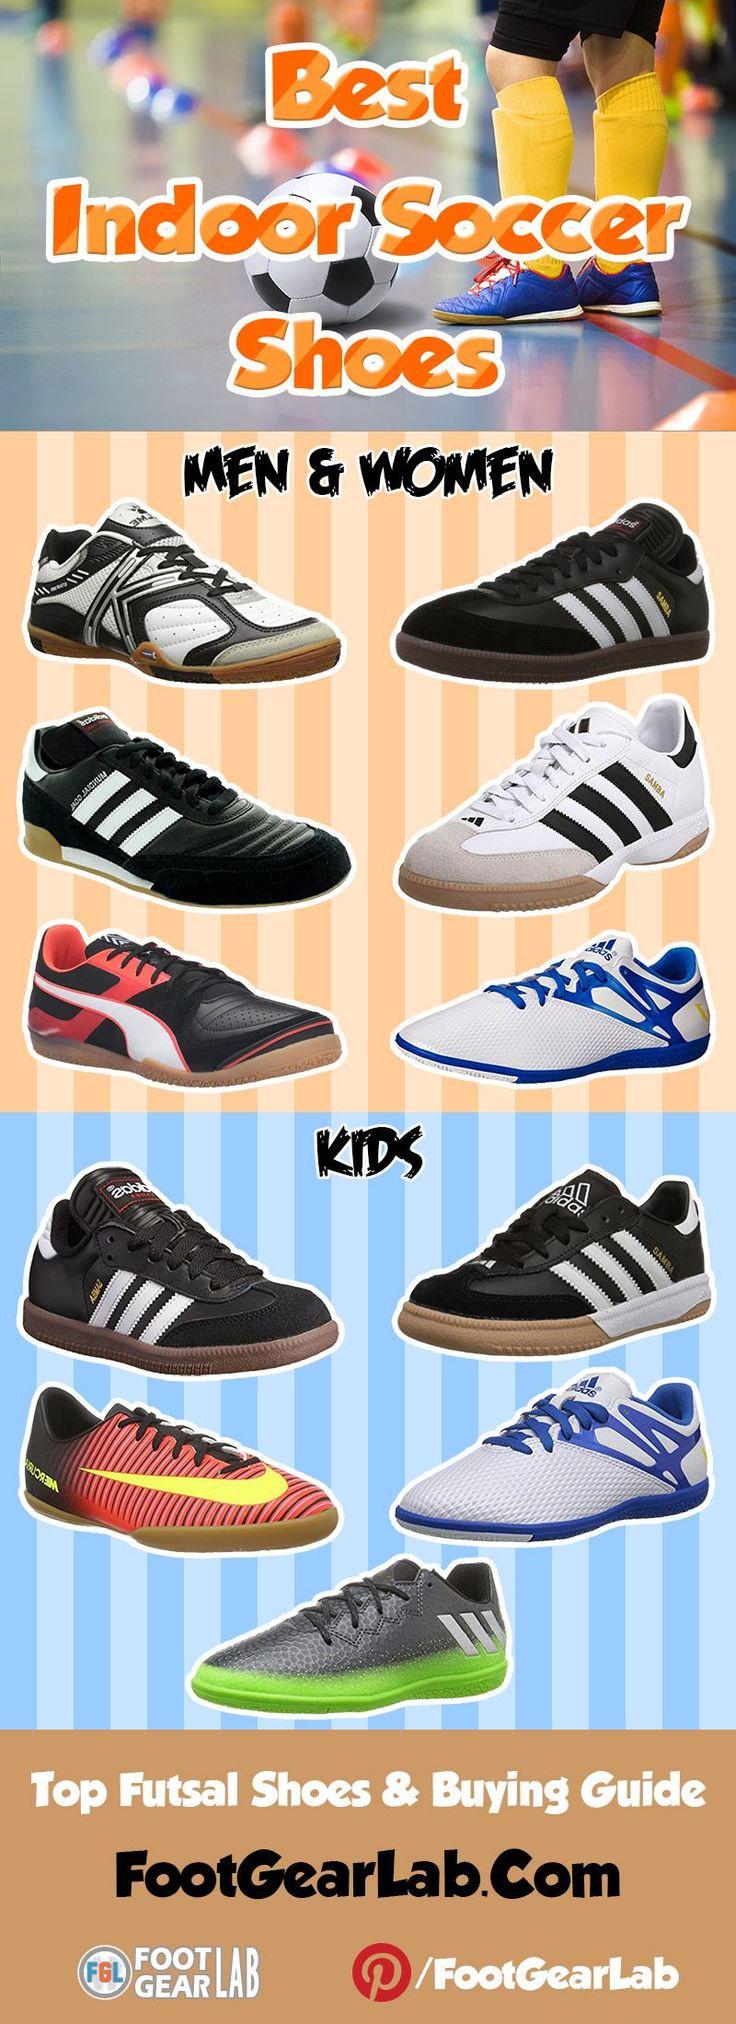 Best Indoor Soccer Shoes: Top Futsal Shoes for men, women and kids. @footgearlab #BestIndoorSoccerShoes #ShoesForMen